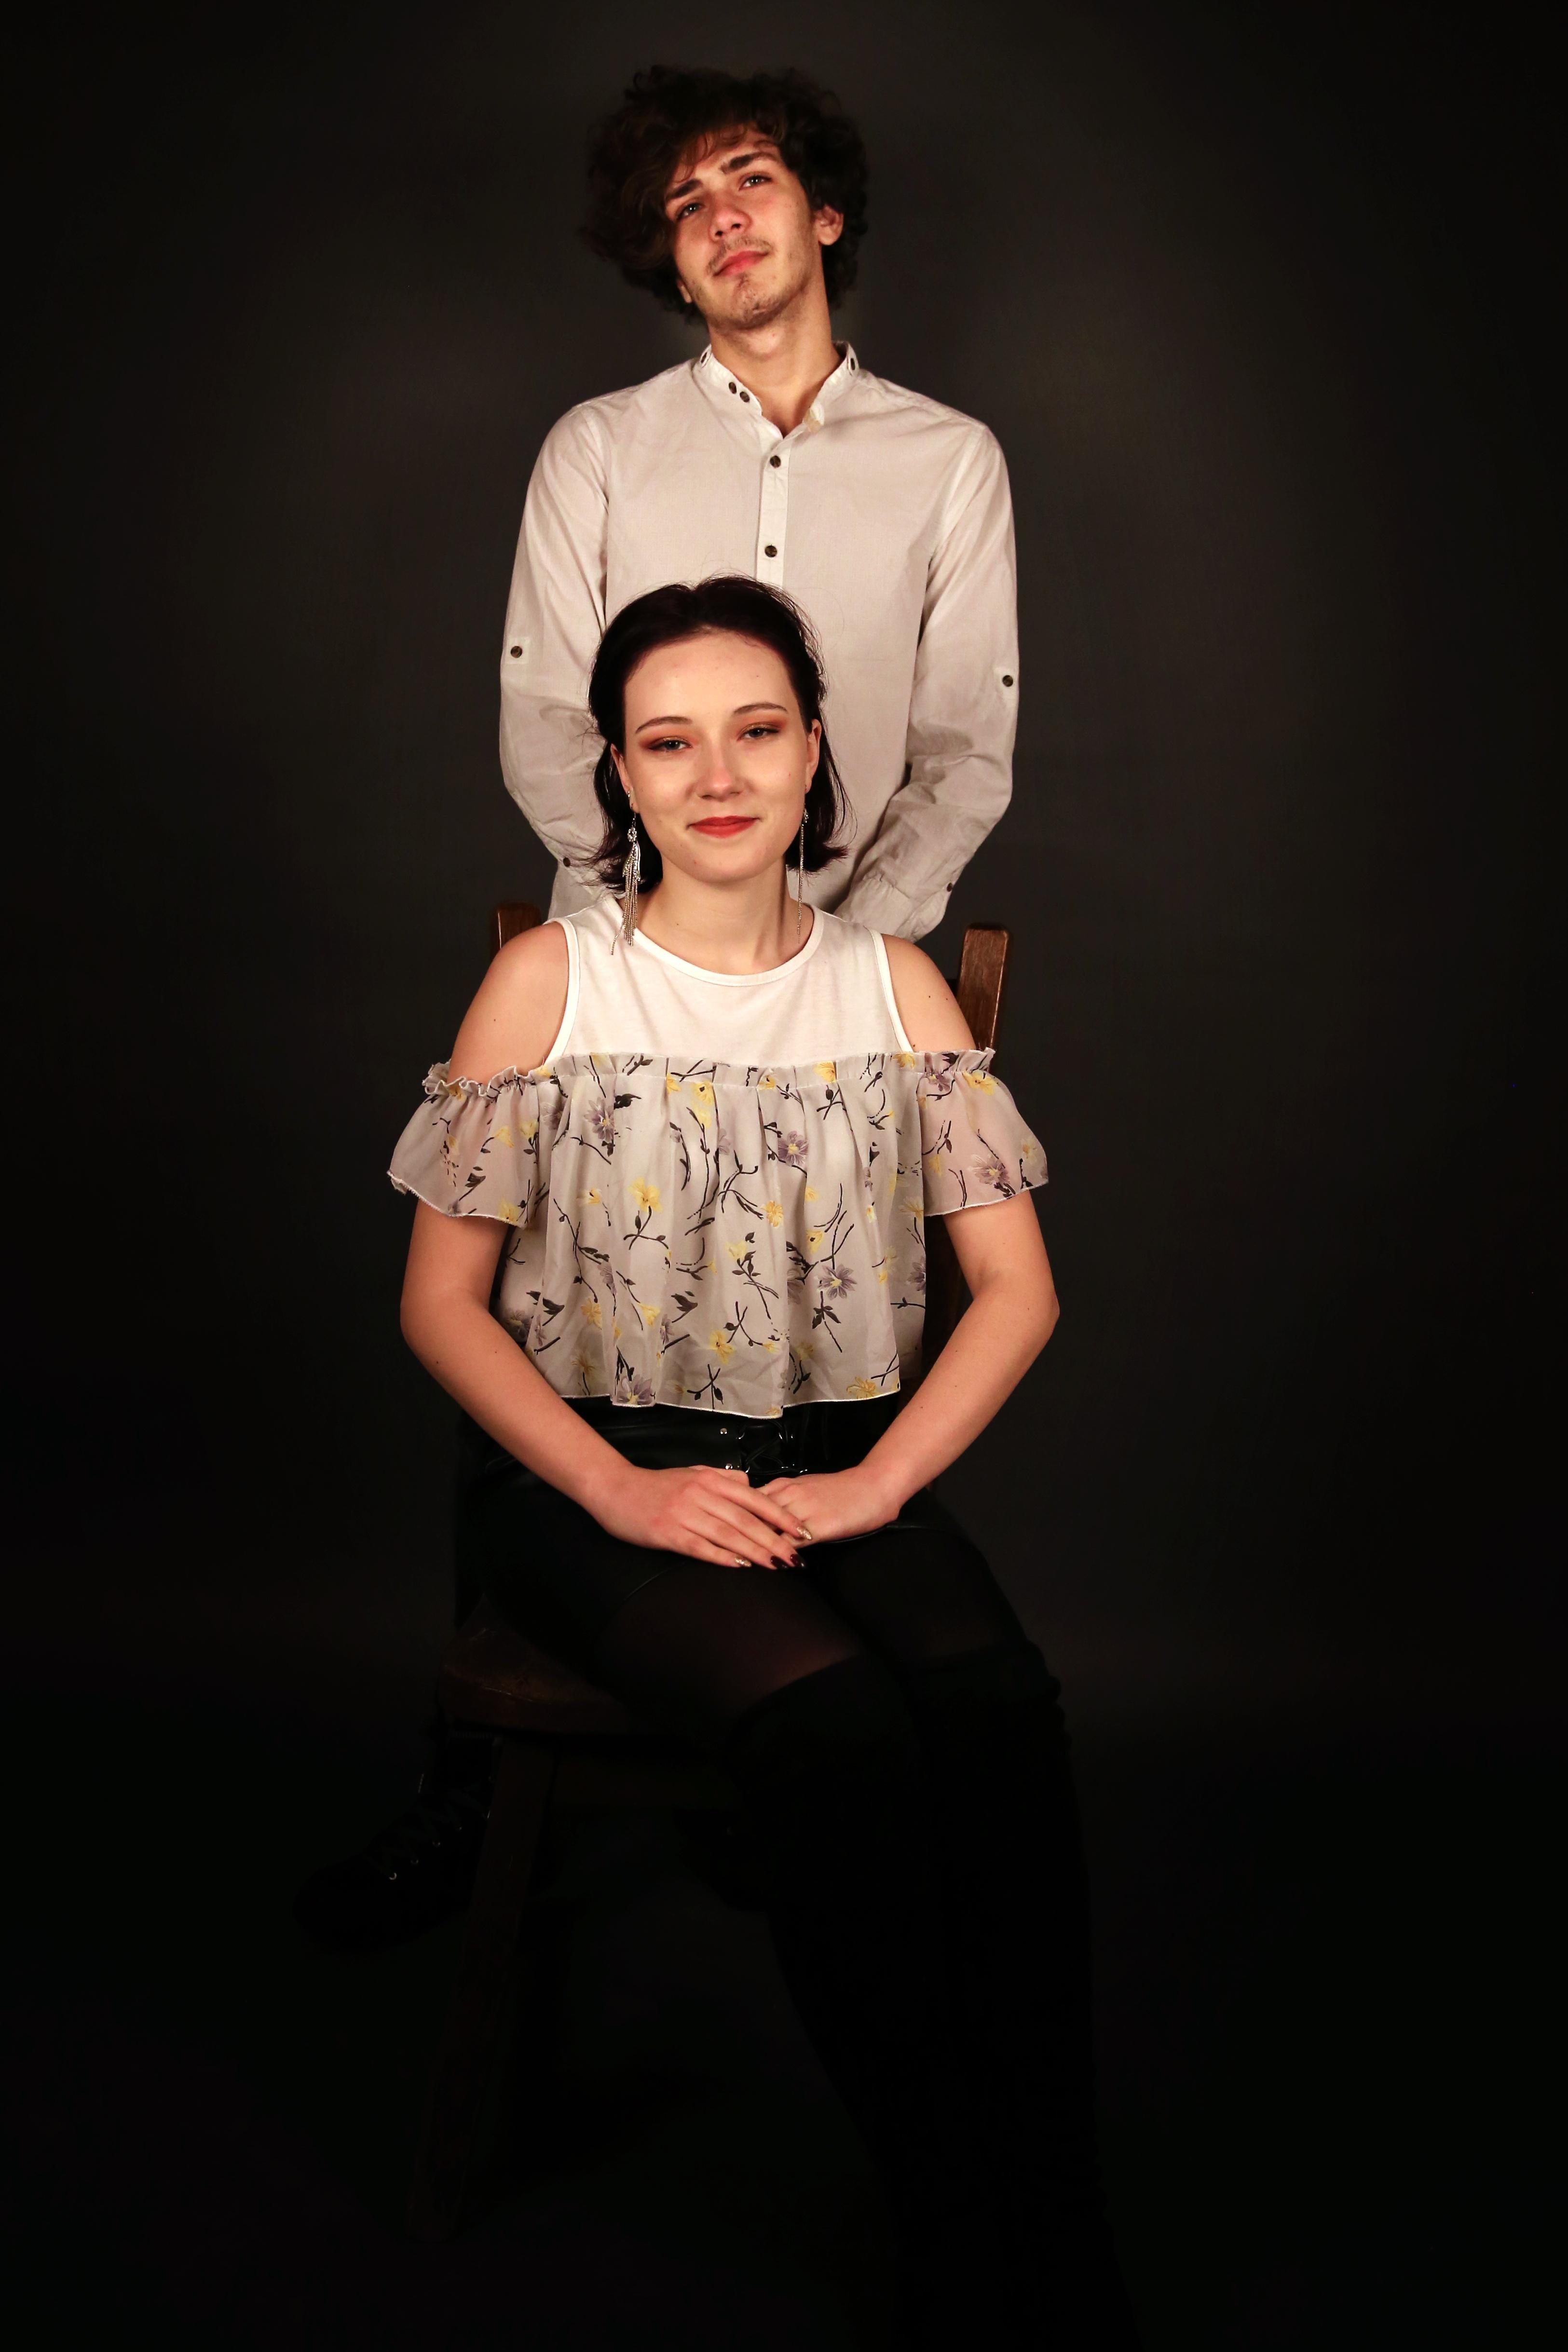 portret - fine art foto